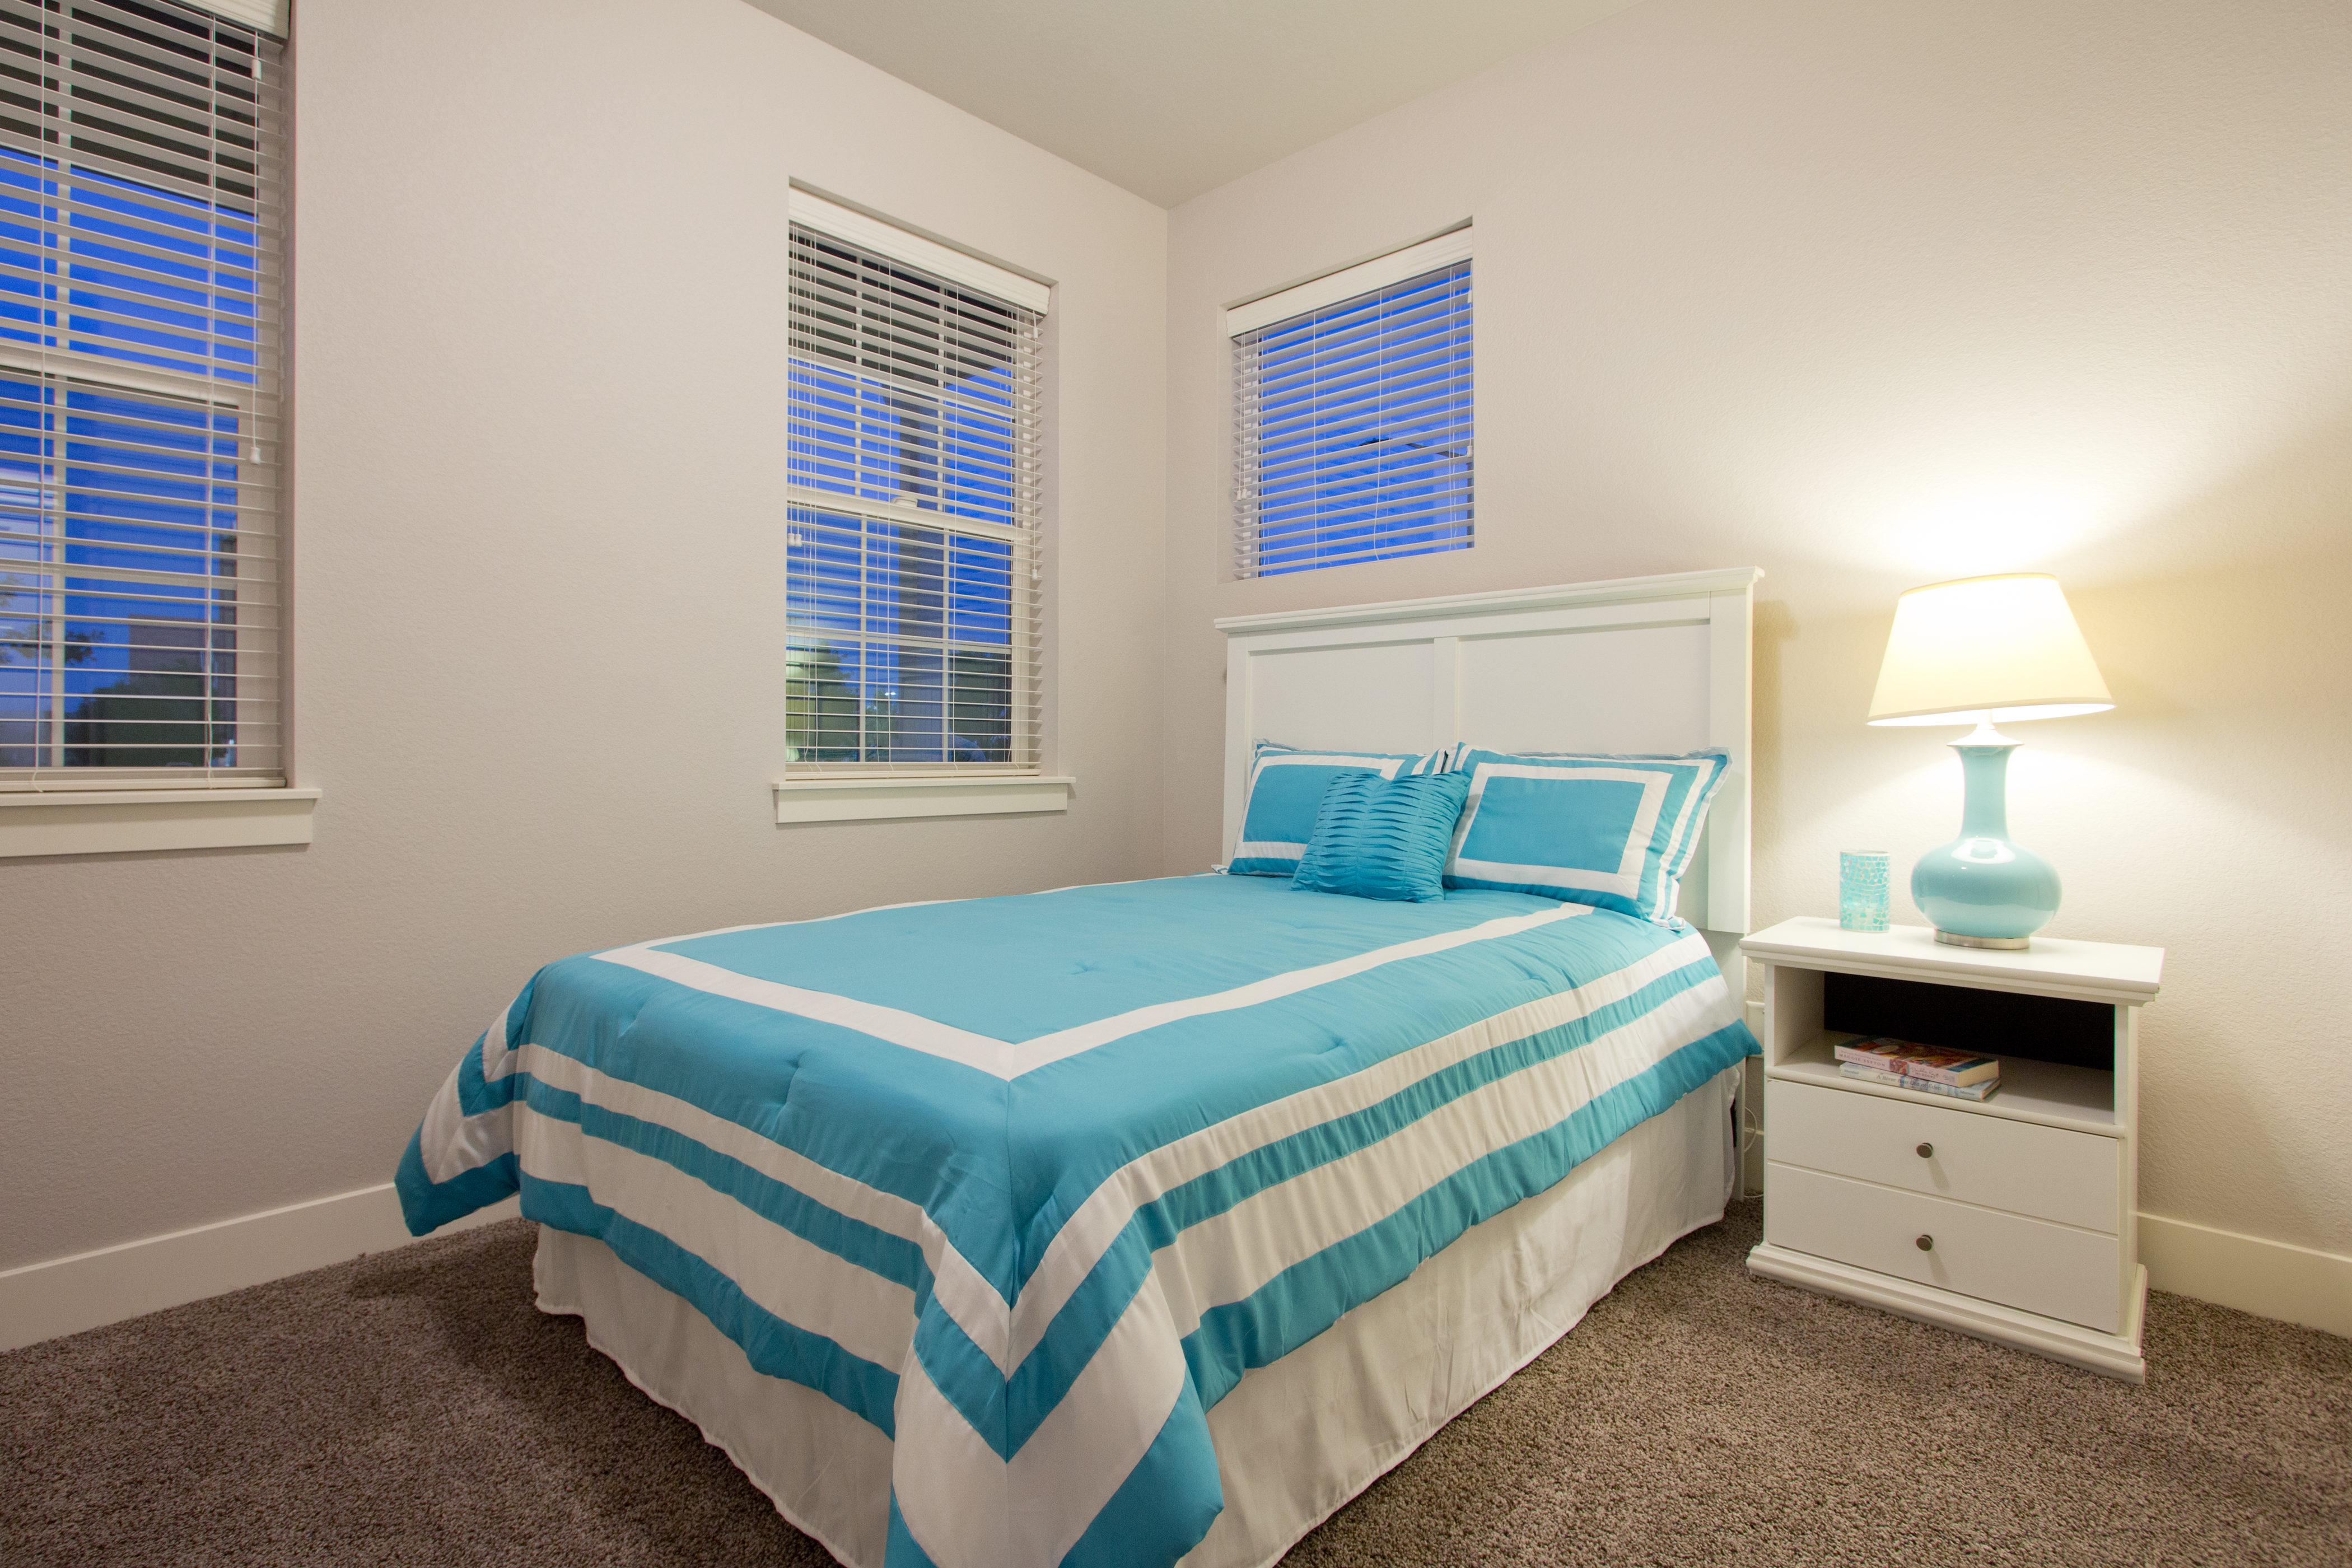 20-montrose-fort_collins-main_floor_bedroom-new_homes_for_sale